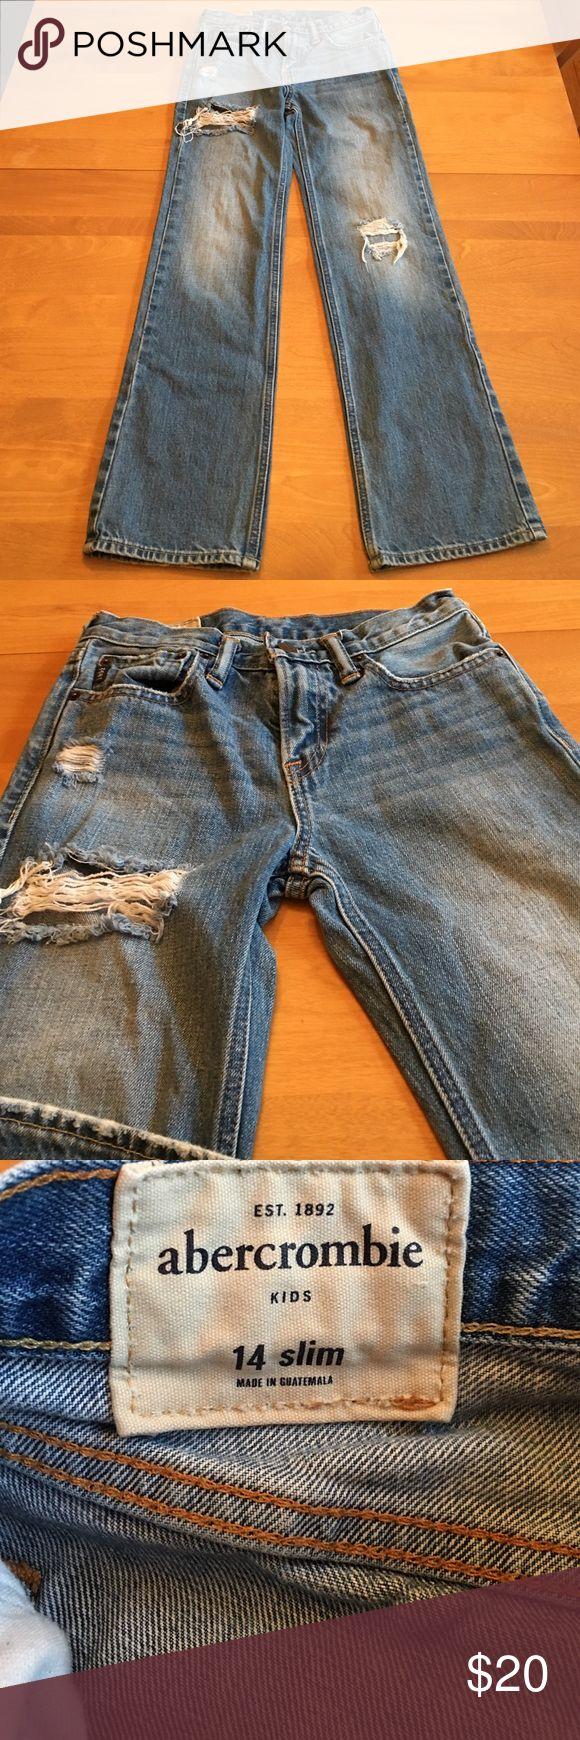 Boys Abercrombie Kids Slim Jeans Abercrombie Kids SLIM jeans abercrombie kids Bottoms Jeans